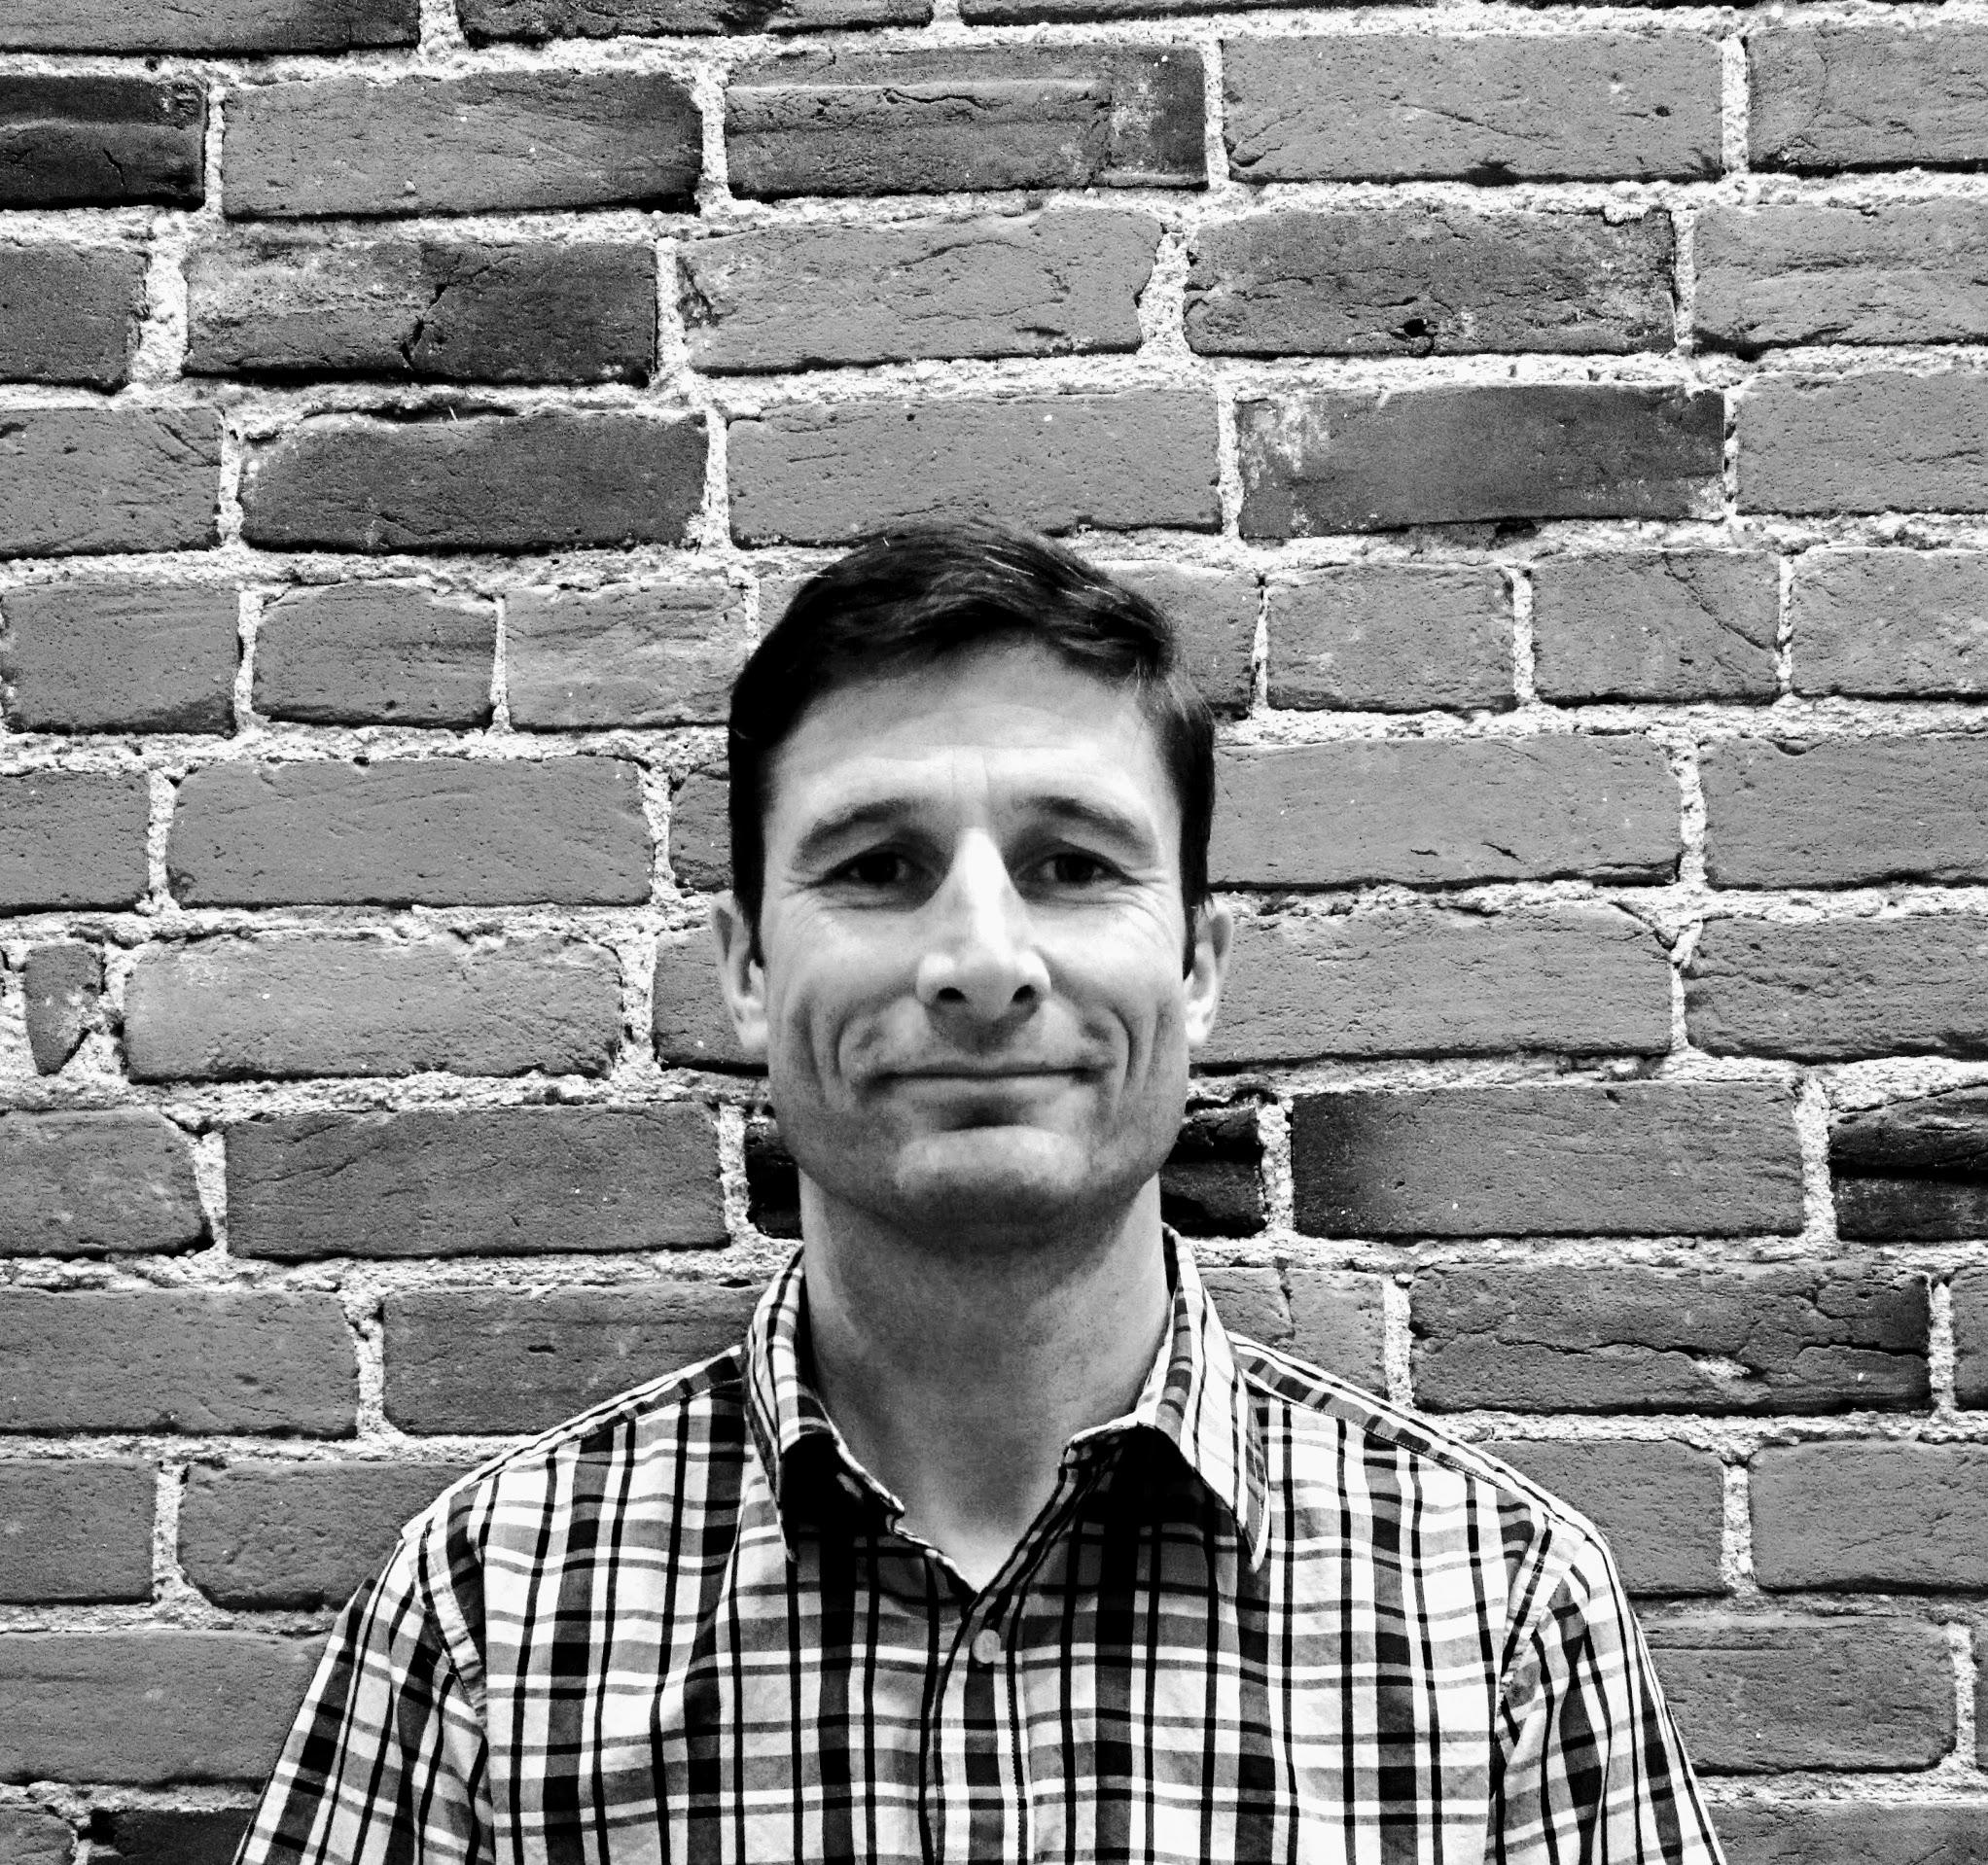 Ring Clojure mentor, Ring Clojure expert, Ring Clojure code help